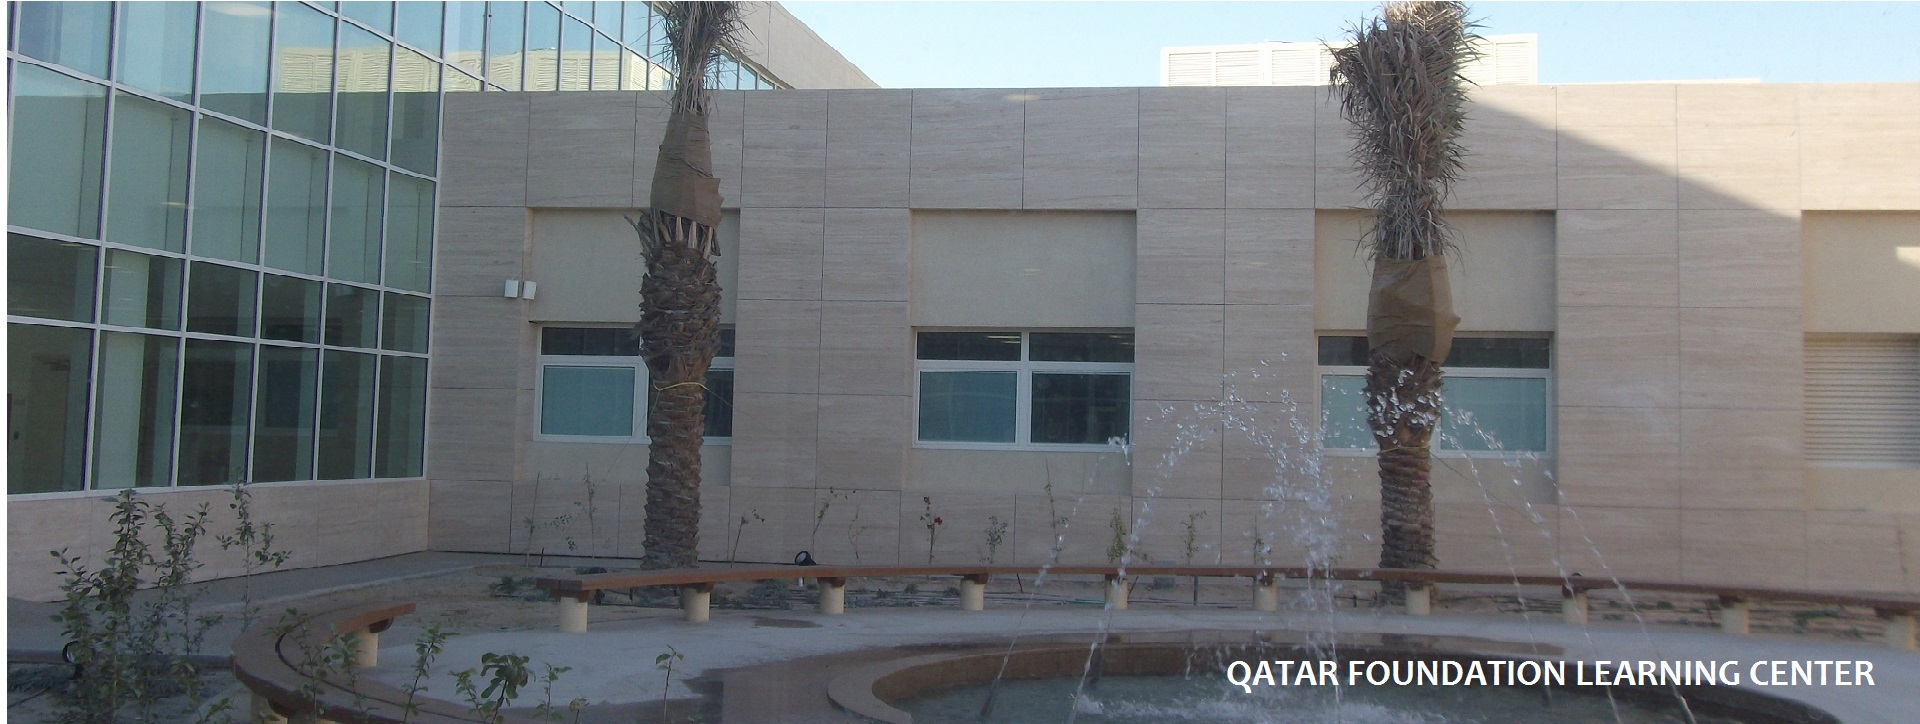 QATAR FOUNDATION LEARNING CENTER 2